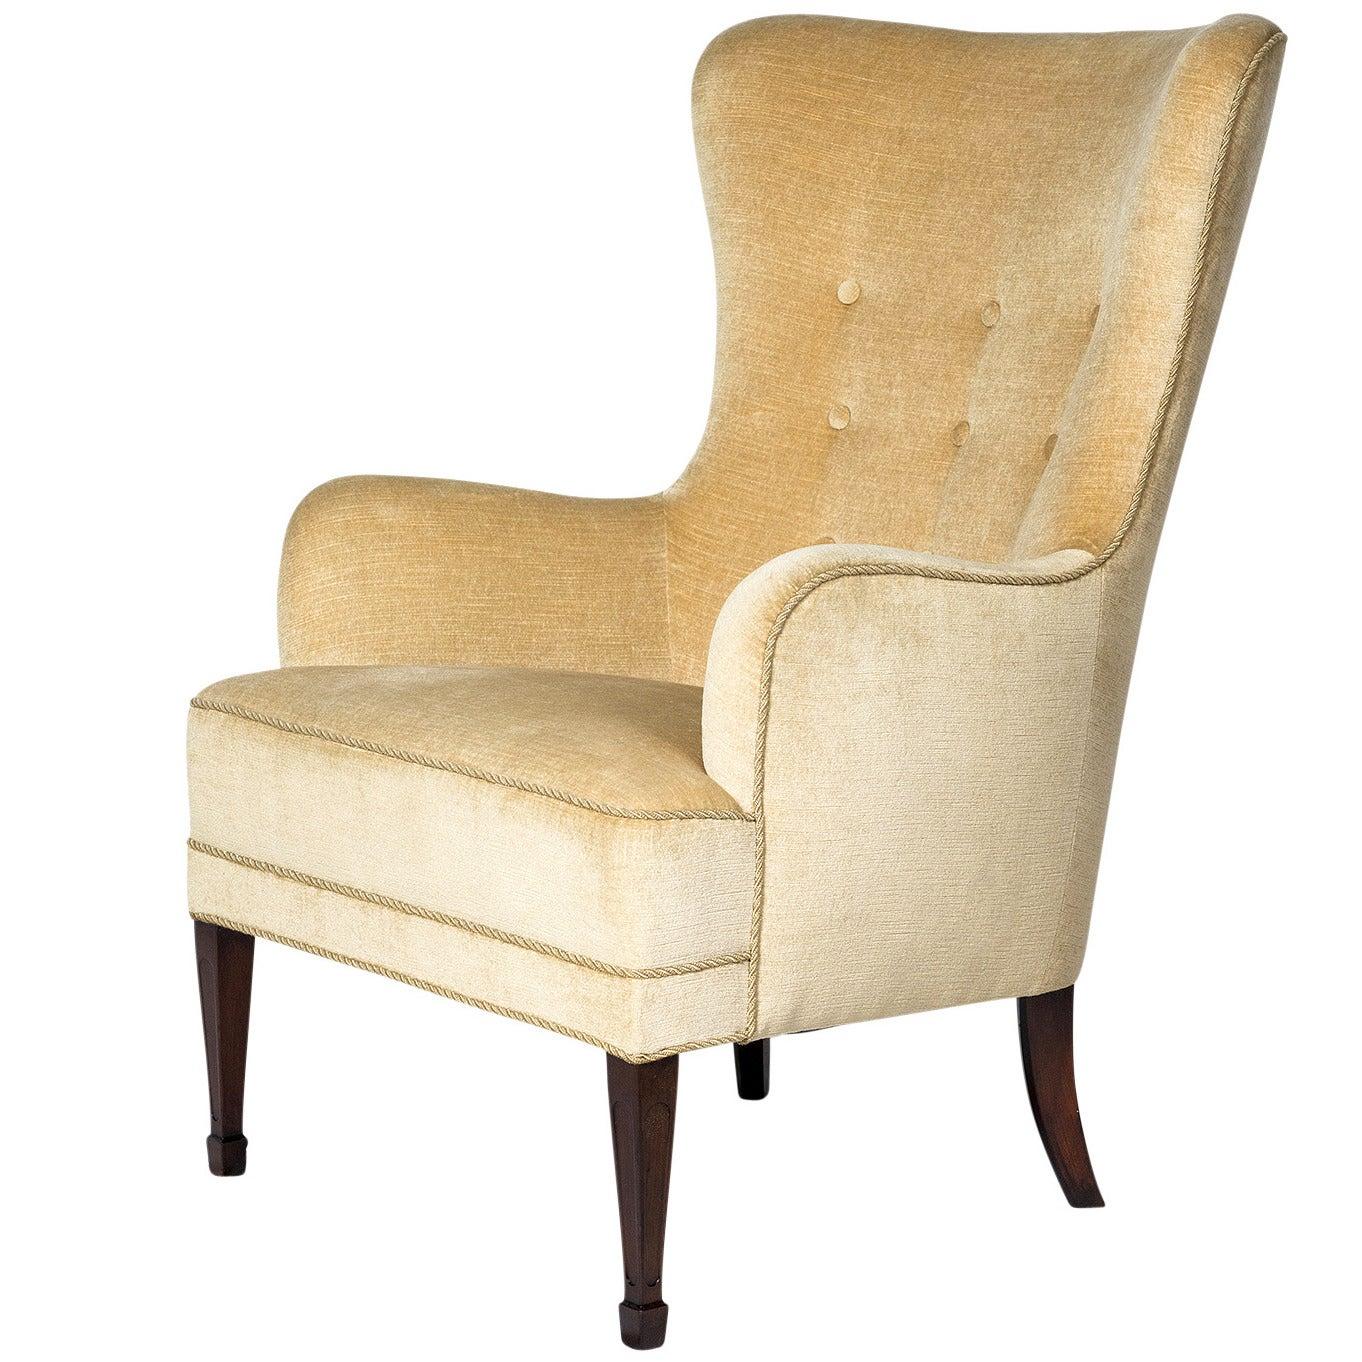 Frits Henningsen High Back Lounge Chair